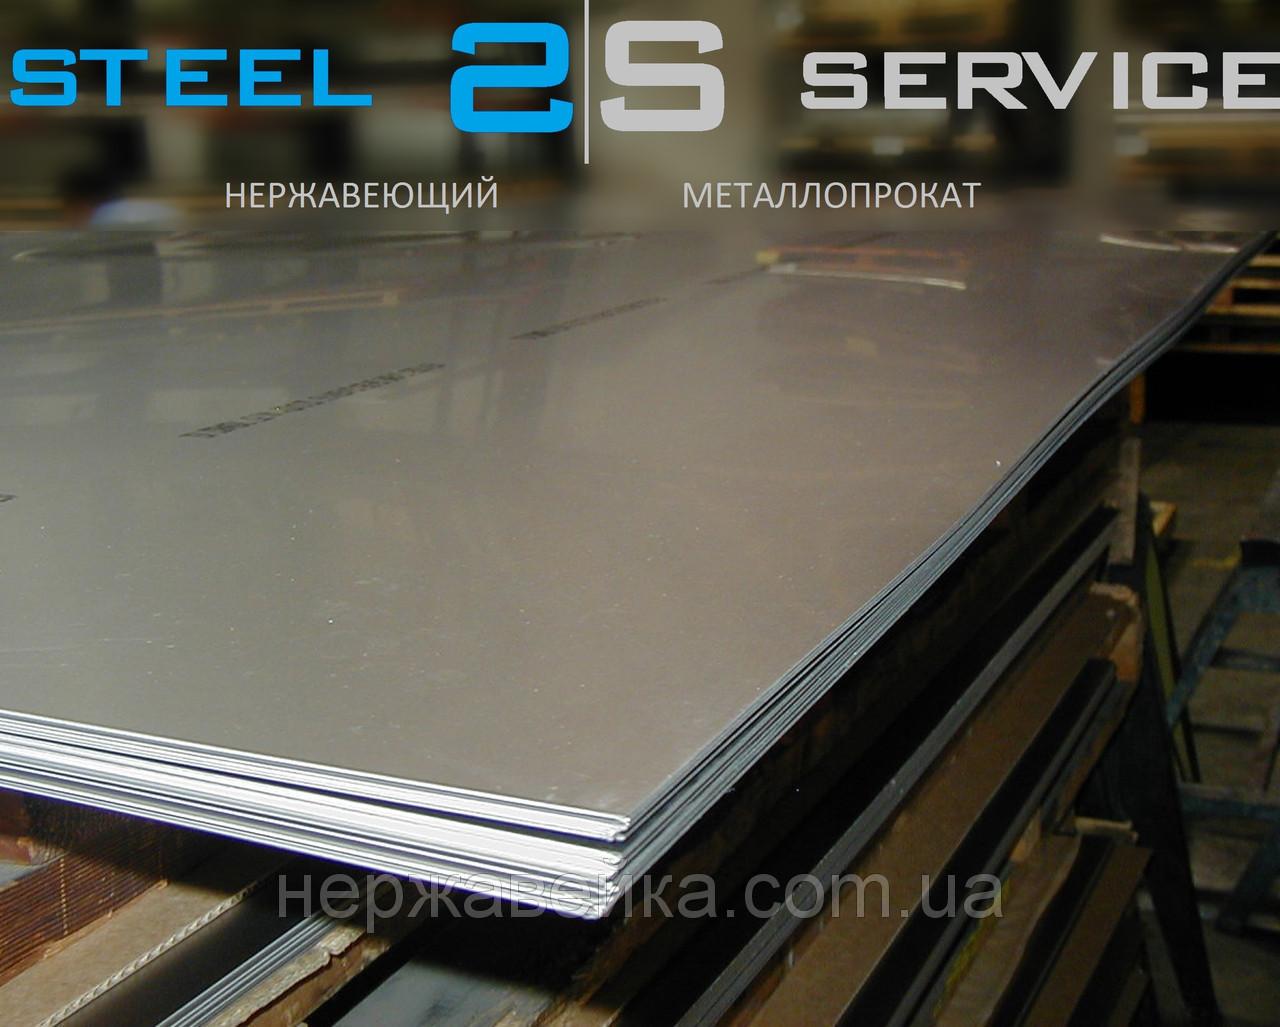 Нержавеющий лист 1,5х1500х3000мм AISI 430(12Х17) 4N - шлифованный, технический